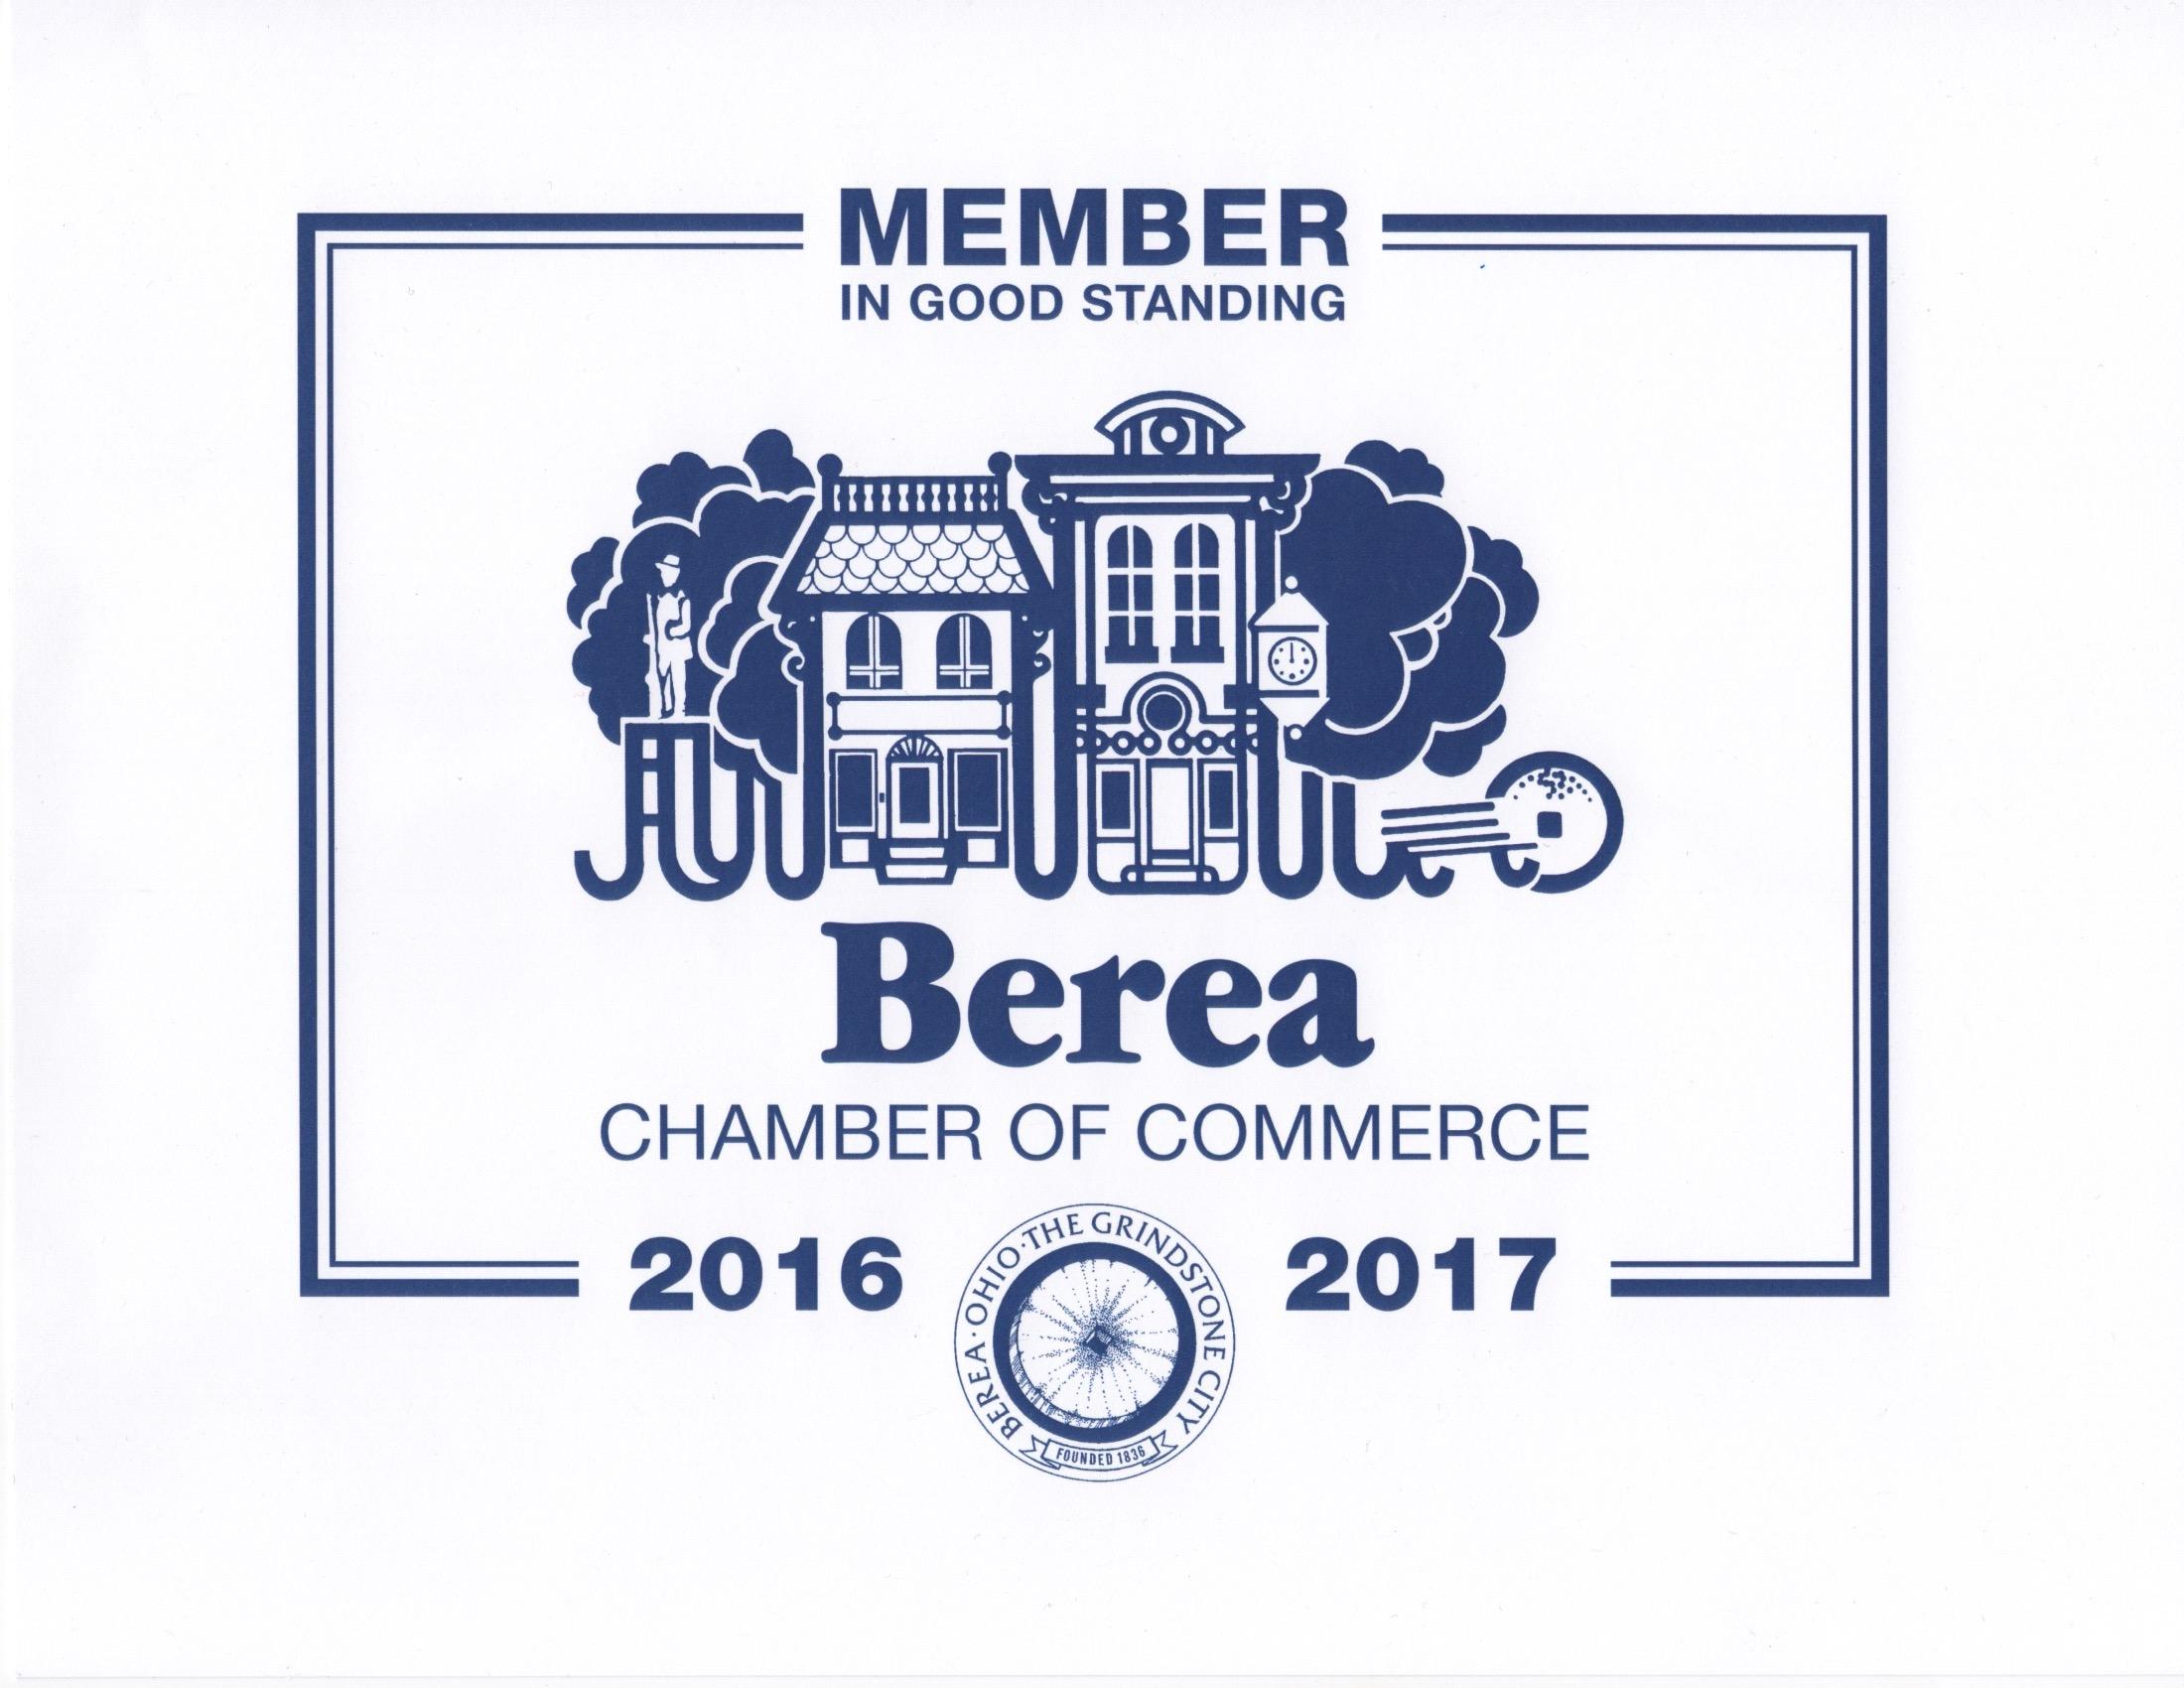 Berea Chamber Of Commerce.jpeg